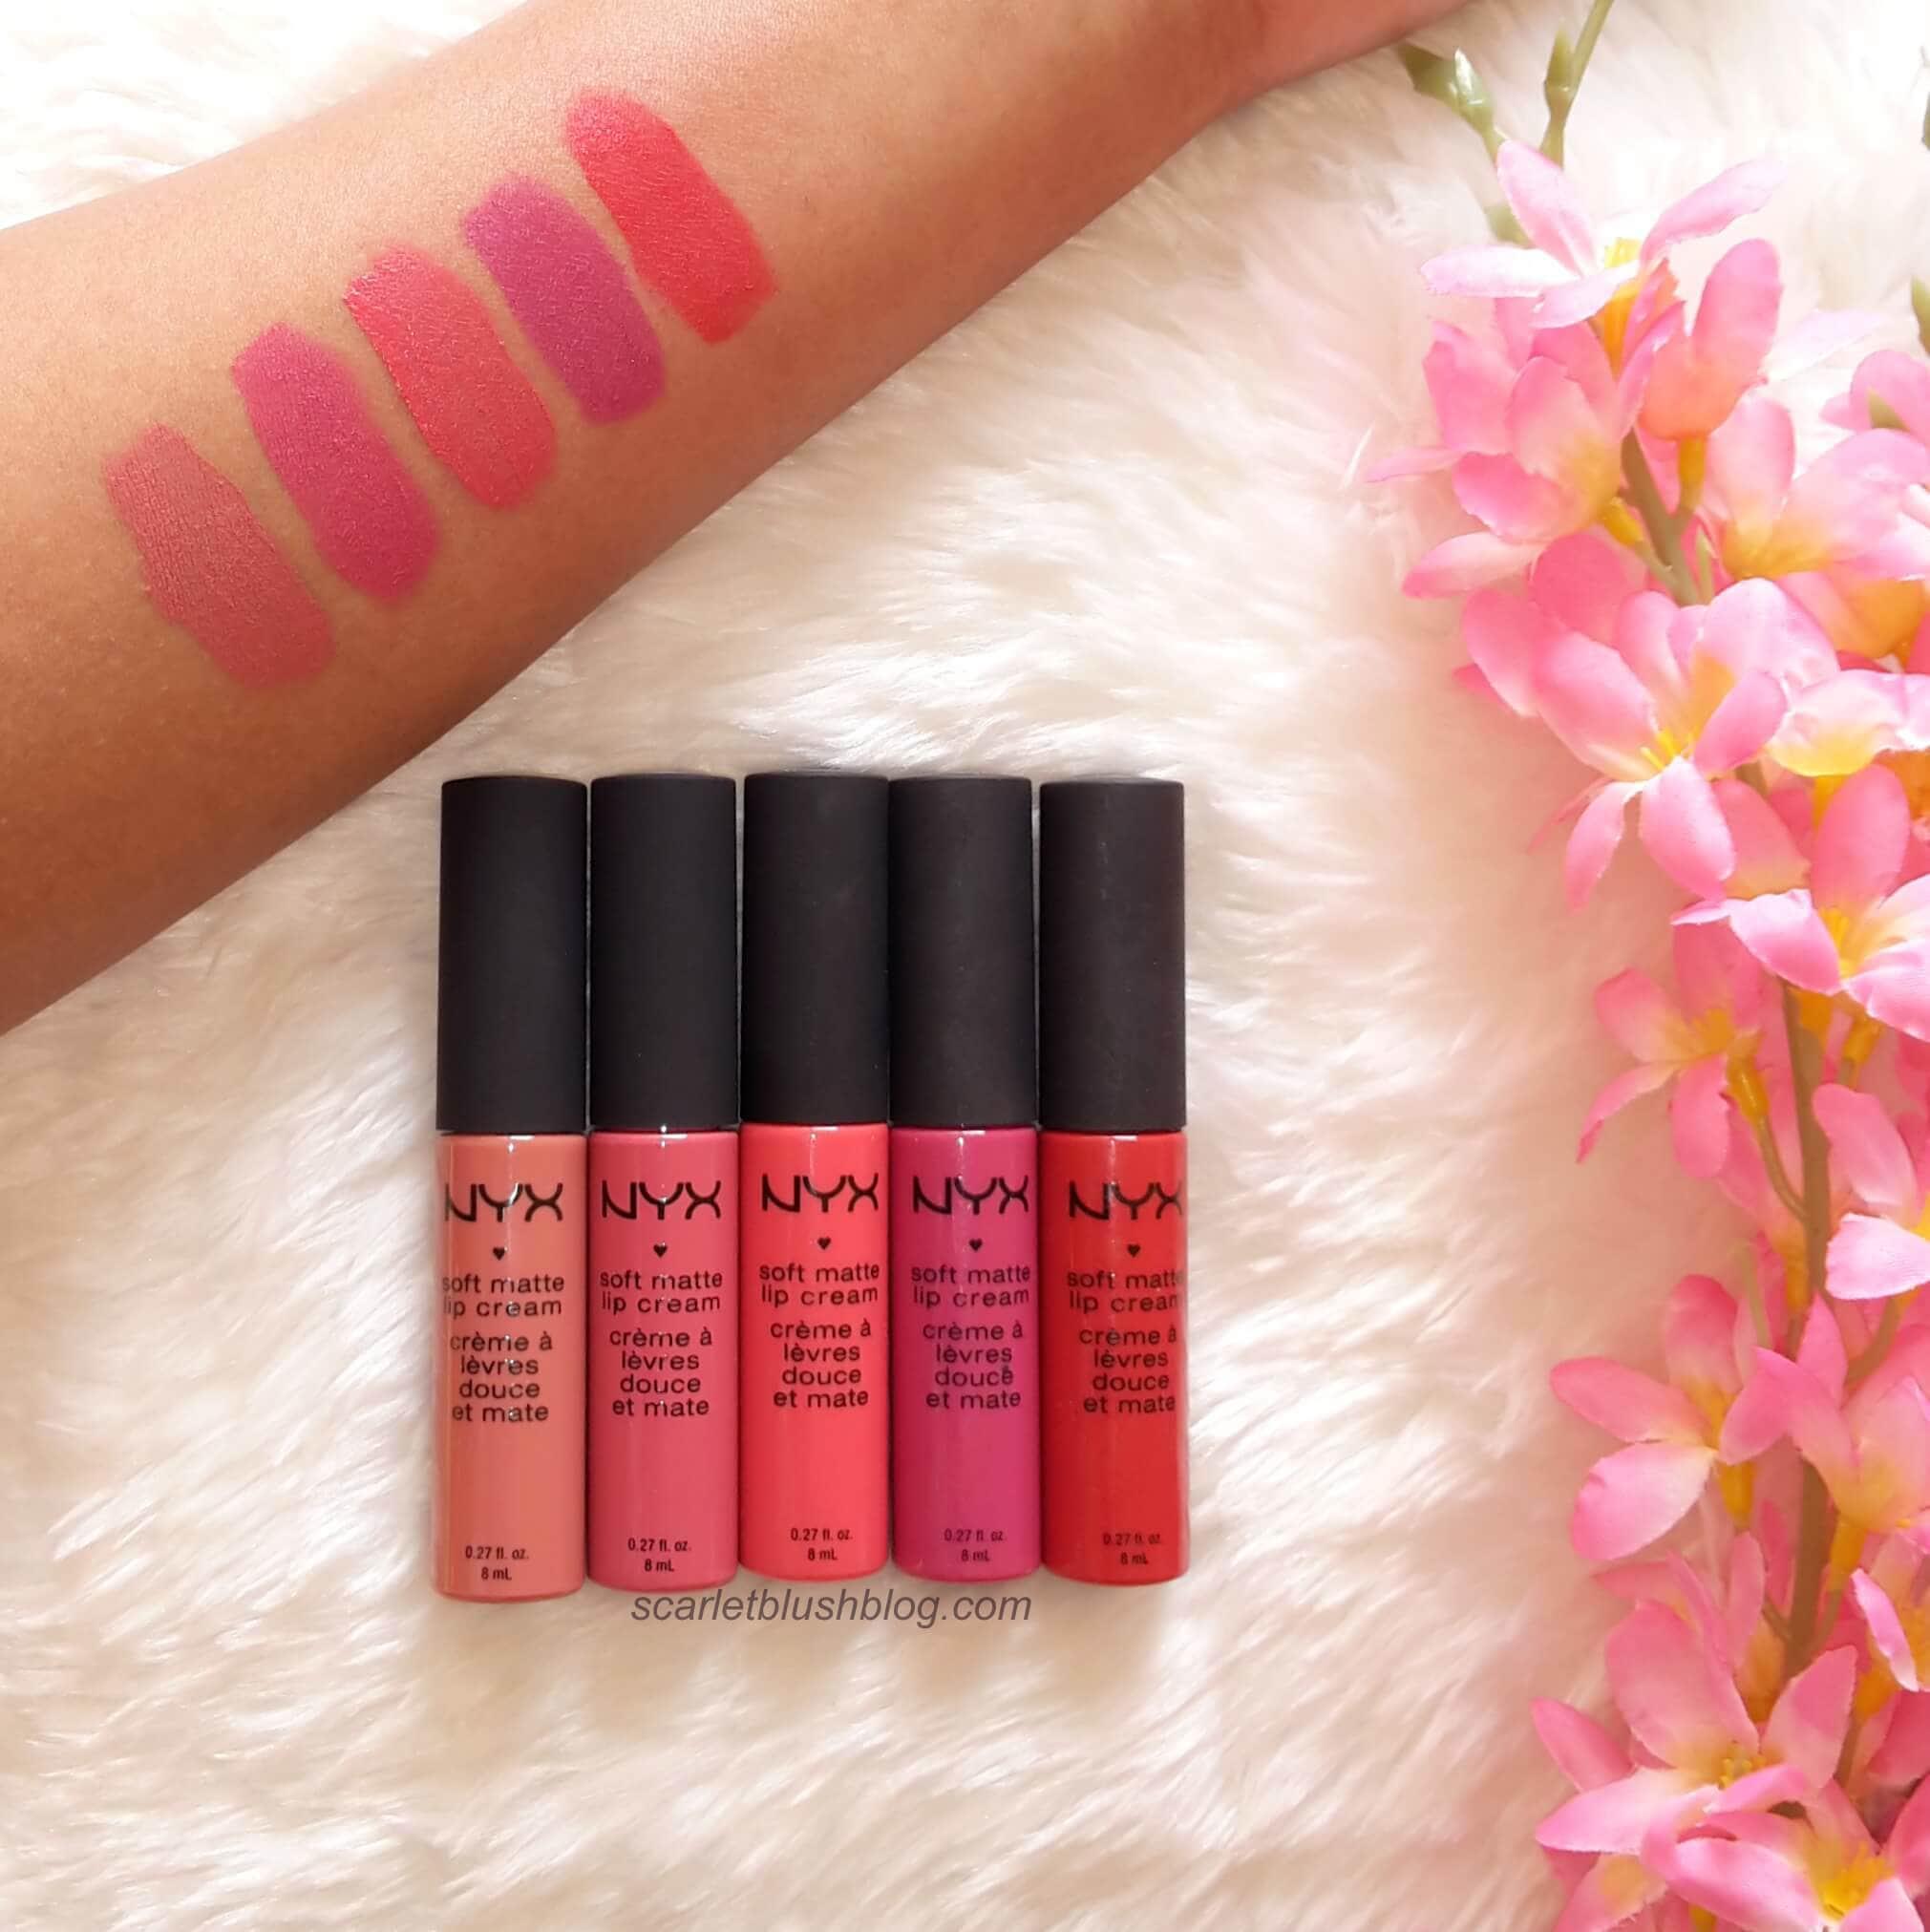 Jual Lipstik Nyx Soft Matte Lipcream Lipstick Lip Stick Stik Asli Tcash Baru Butter Gloss Original